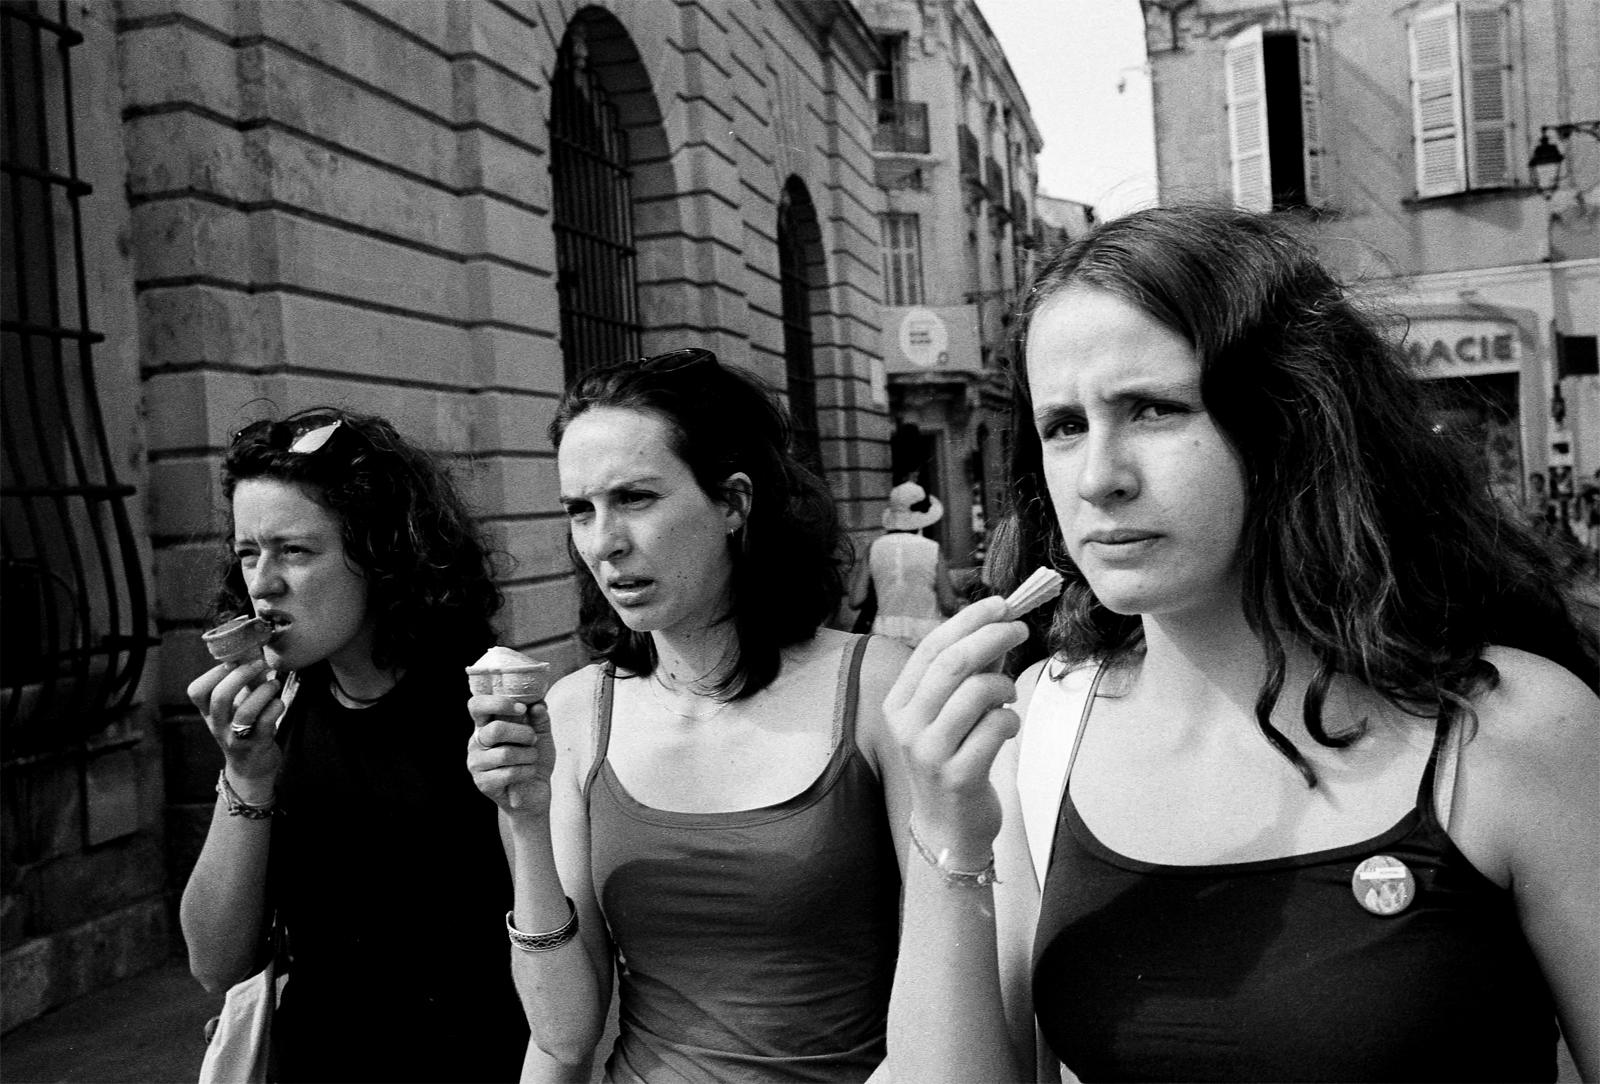 © Ed Muscat Azzopardi / FOTOBOOK #09